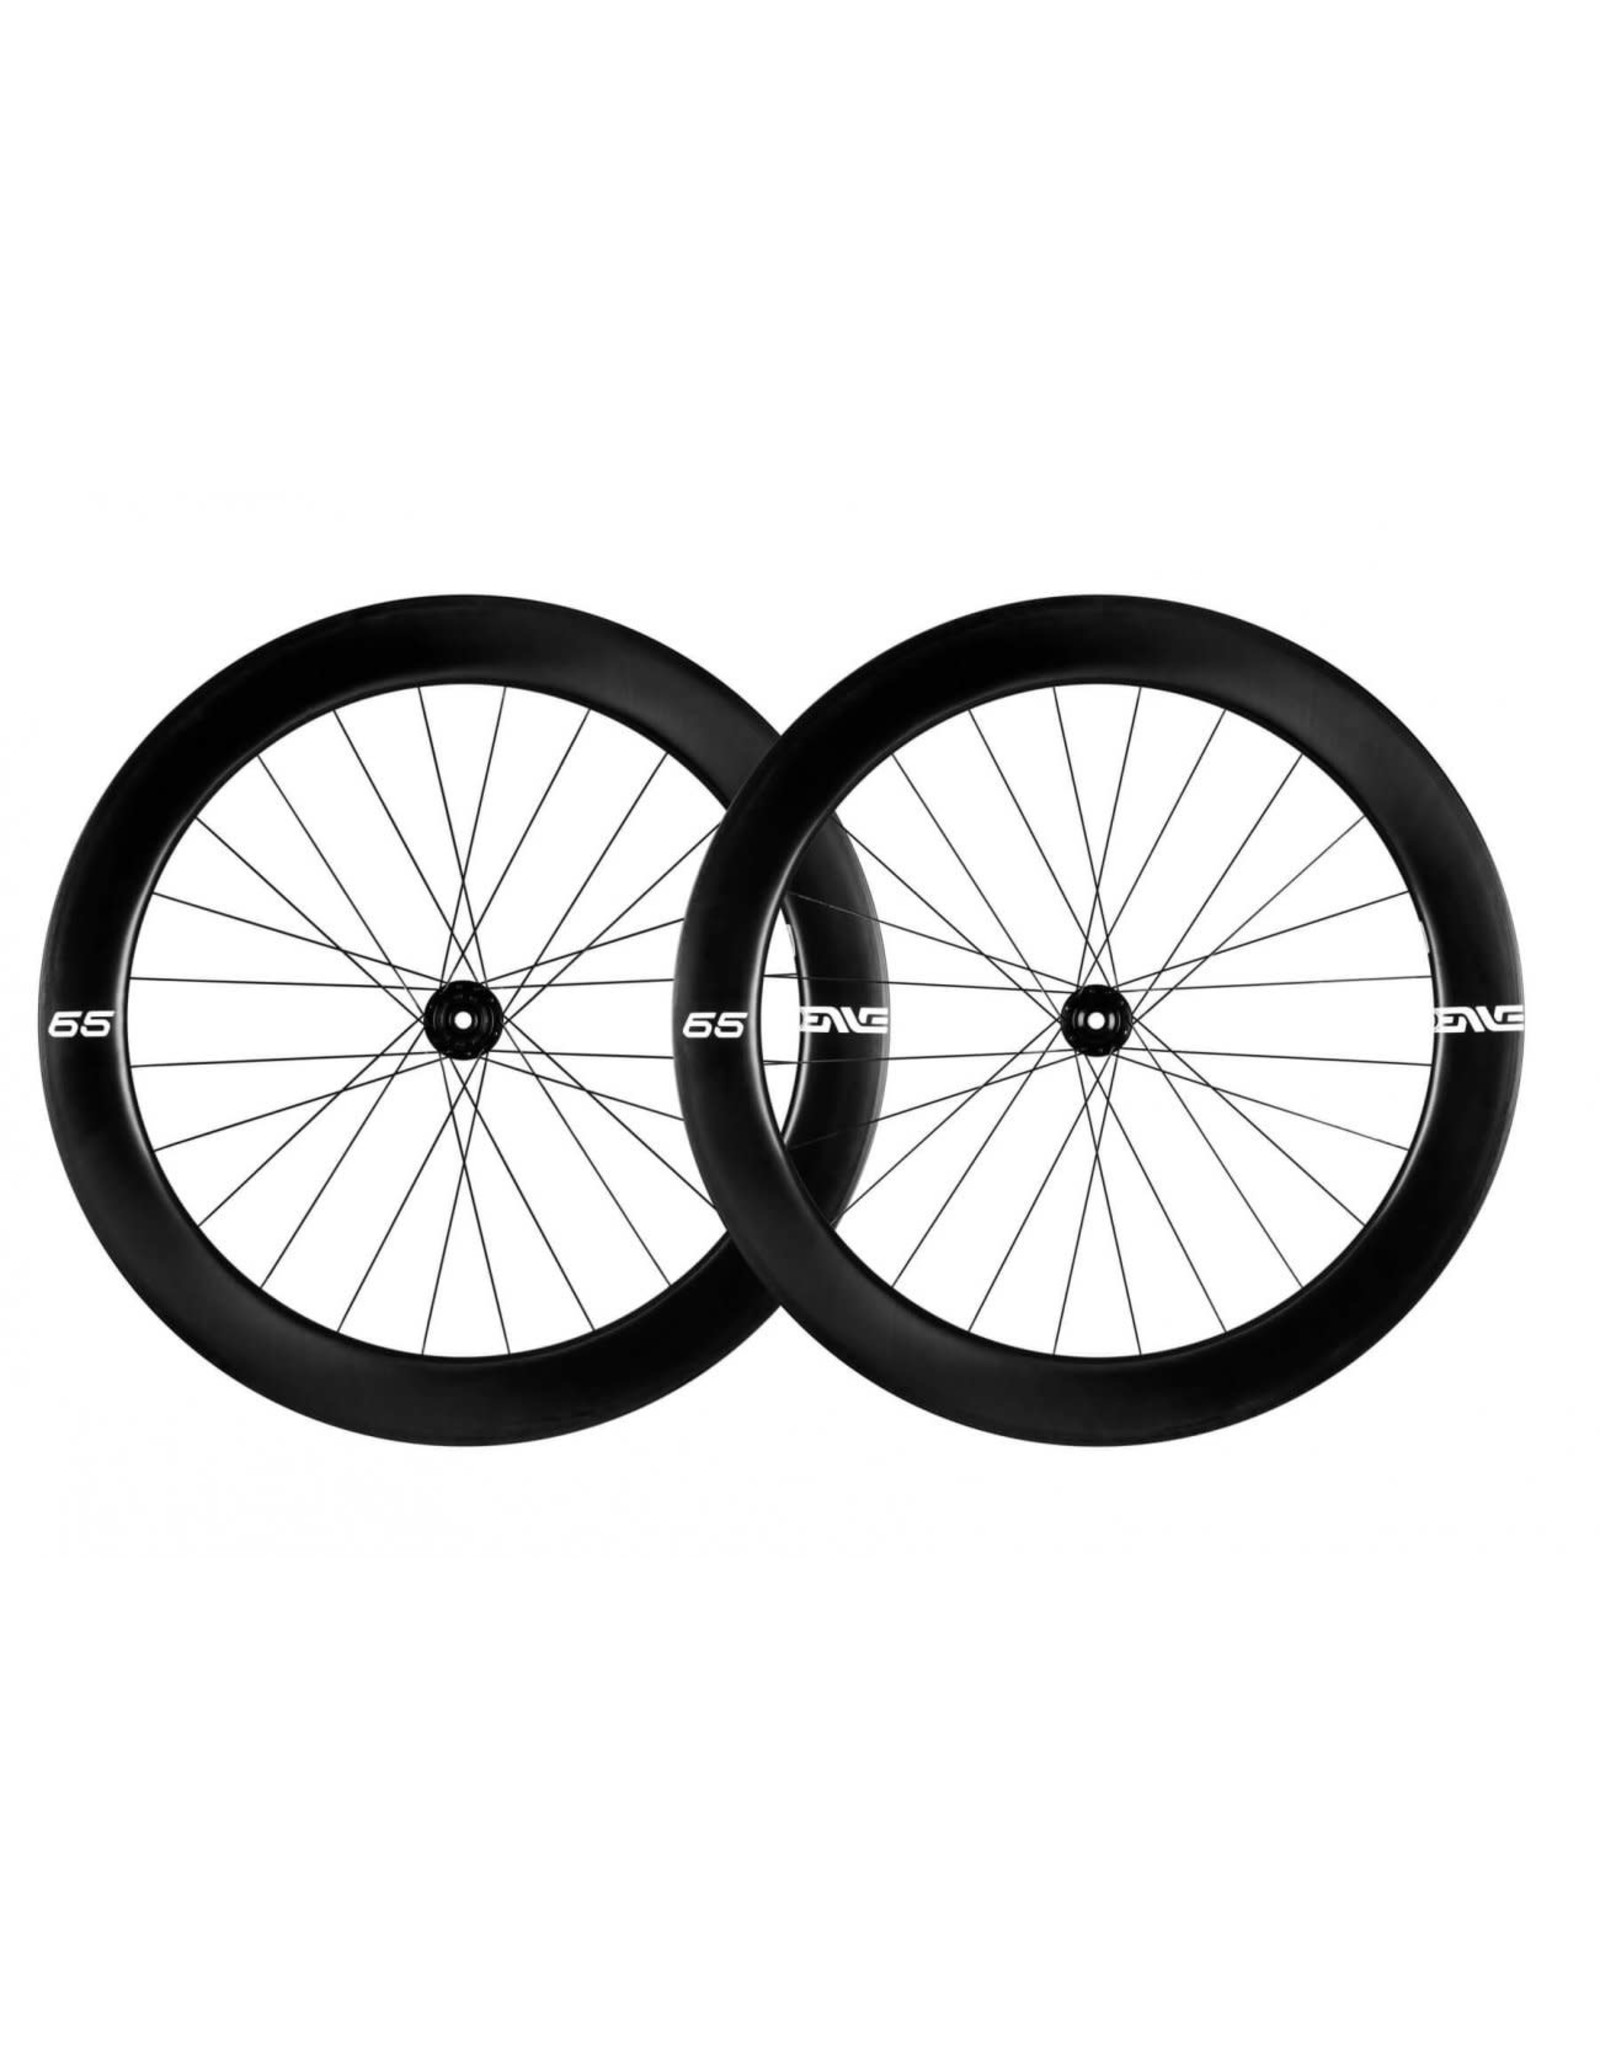 ENVE Composites ENVE 65 Foundation Disc Wheelset - ENVE Alloy (Shimano/SRAM)